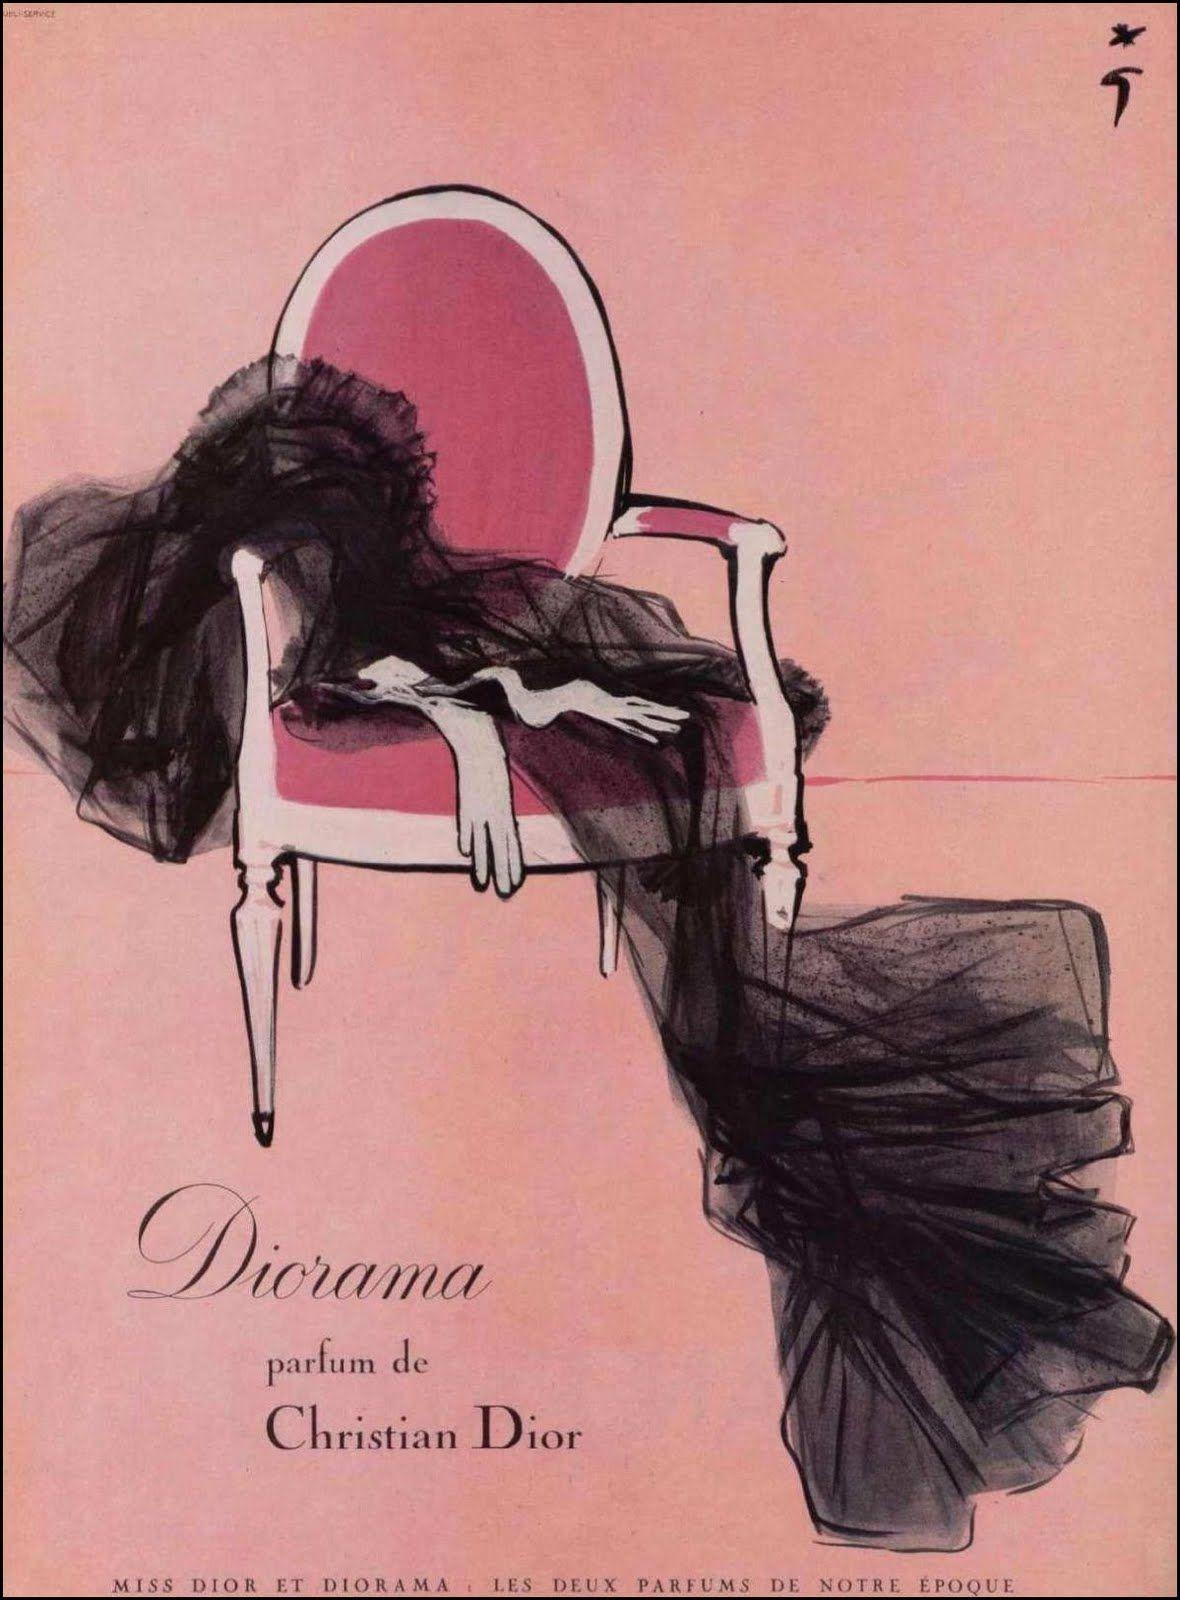 a2c09c2f8 Vintage Christian Dior Perfume Ad